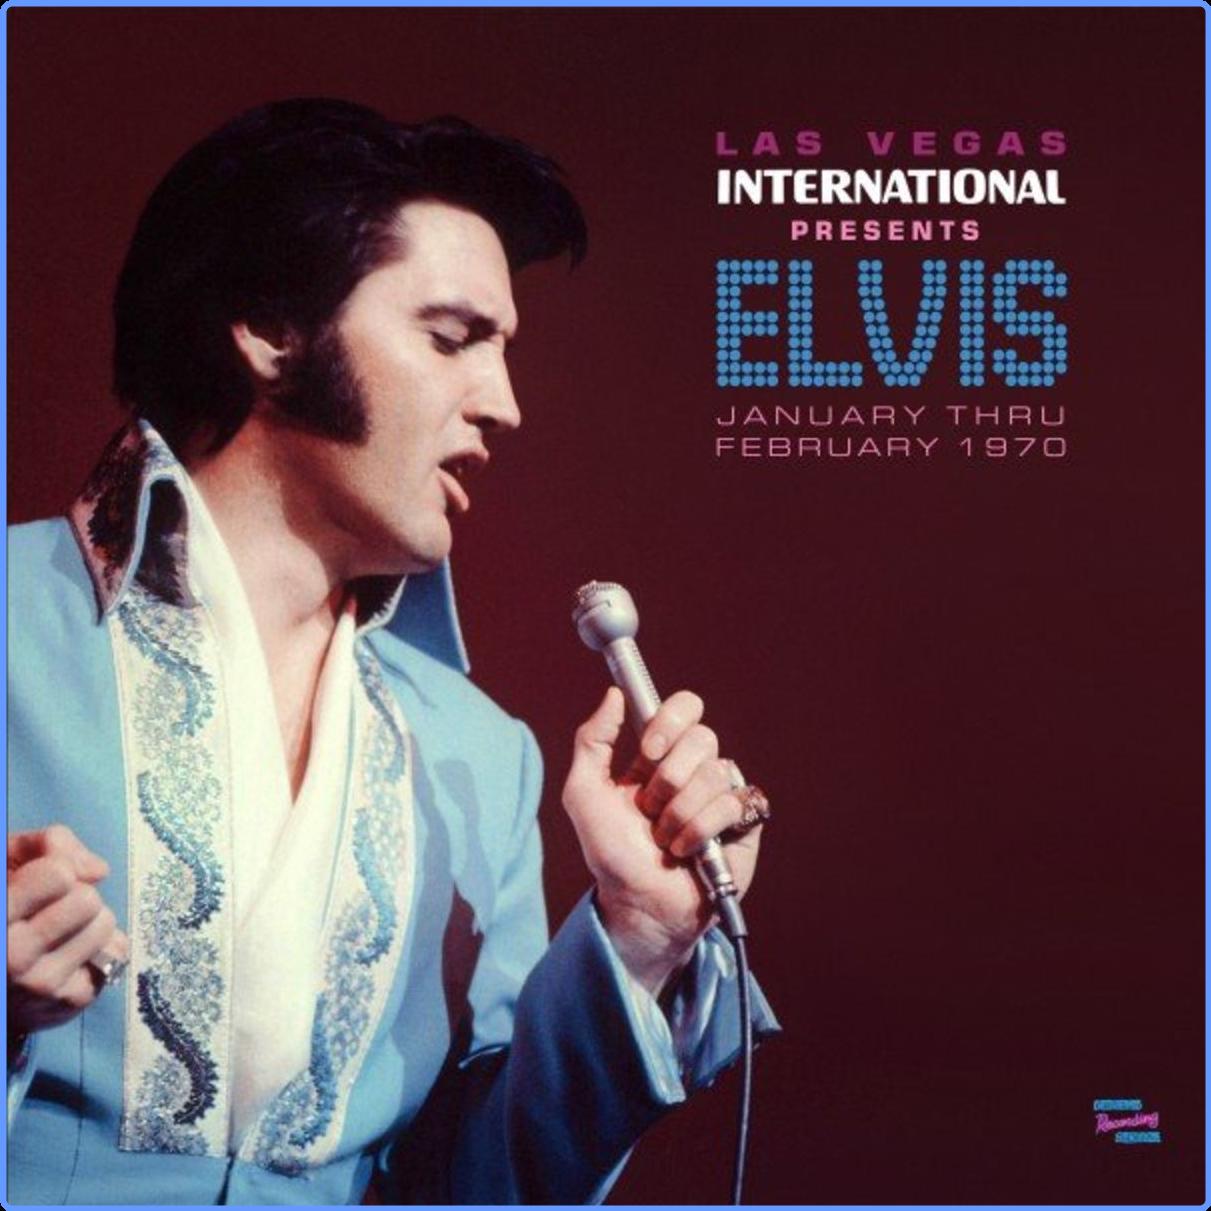 Elvis Presley - Las Vegas International Presents Elvis - January Thru February 1970 (2021) mp3 320 Kbps Scarica Gratis